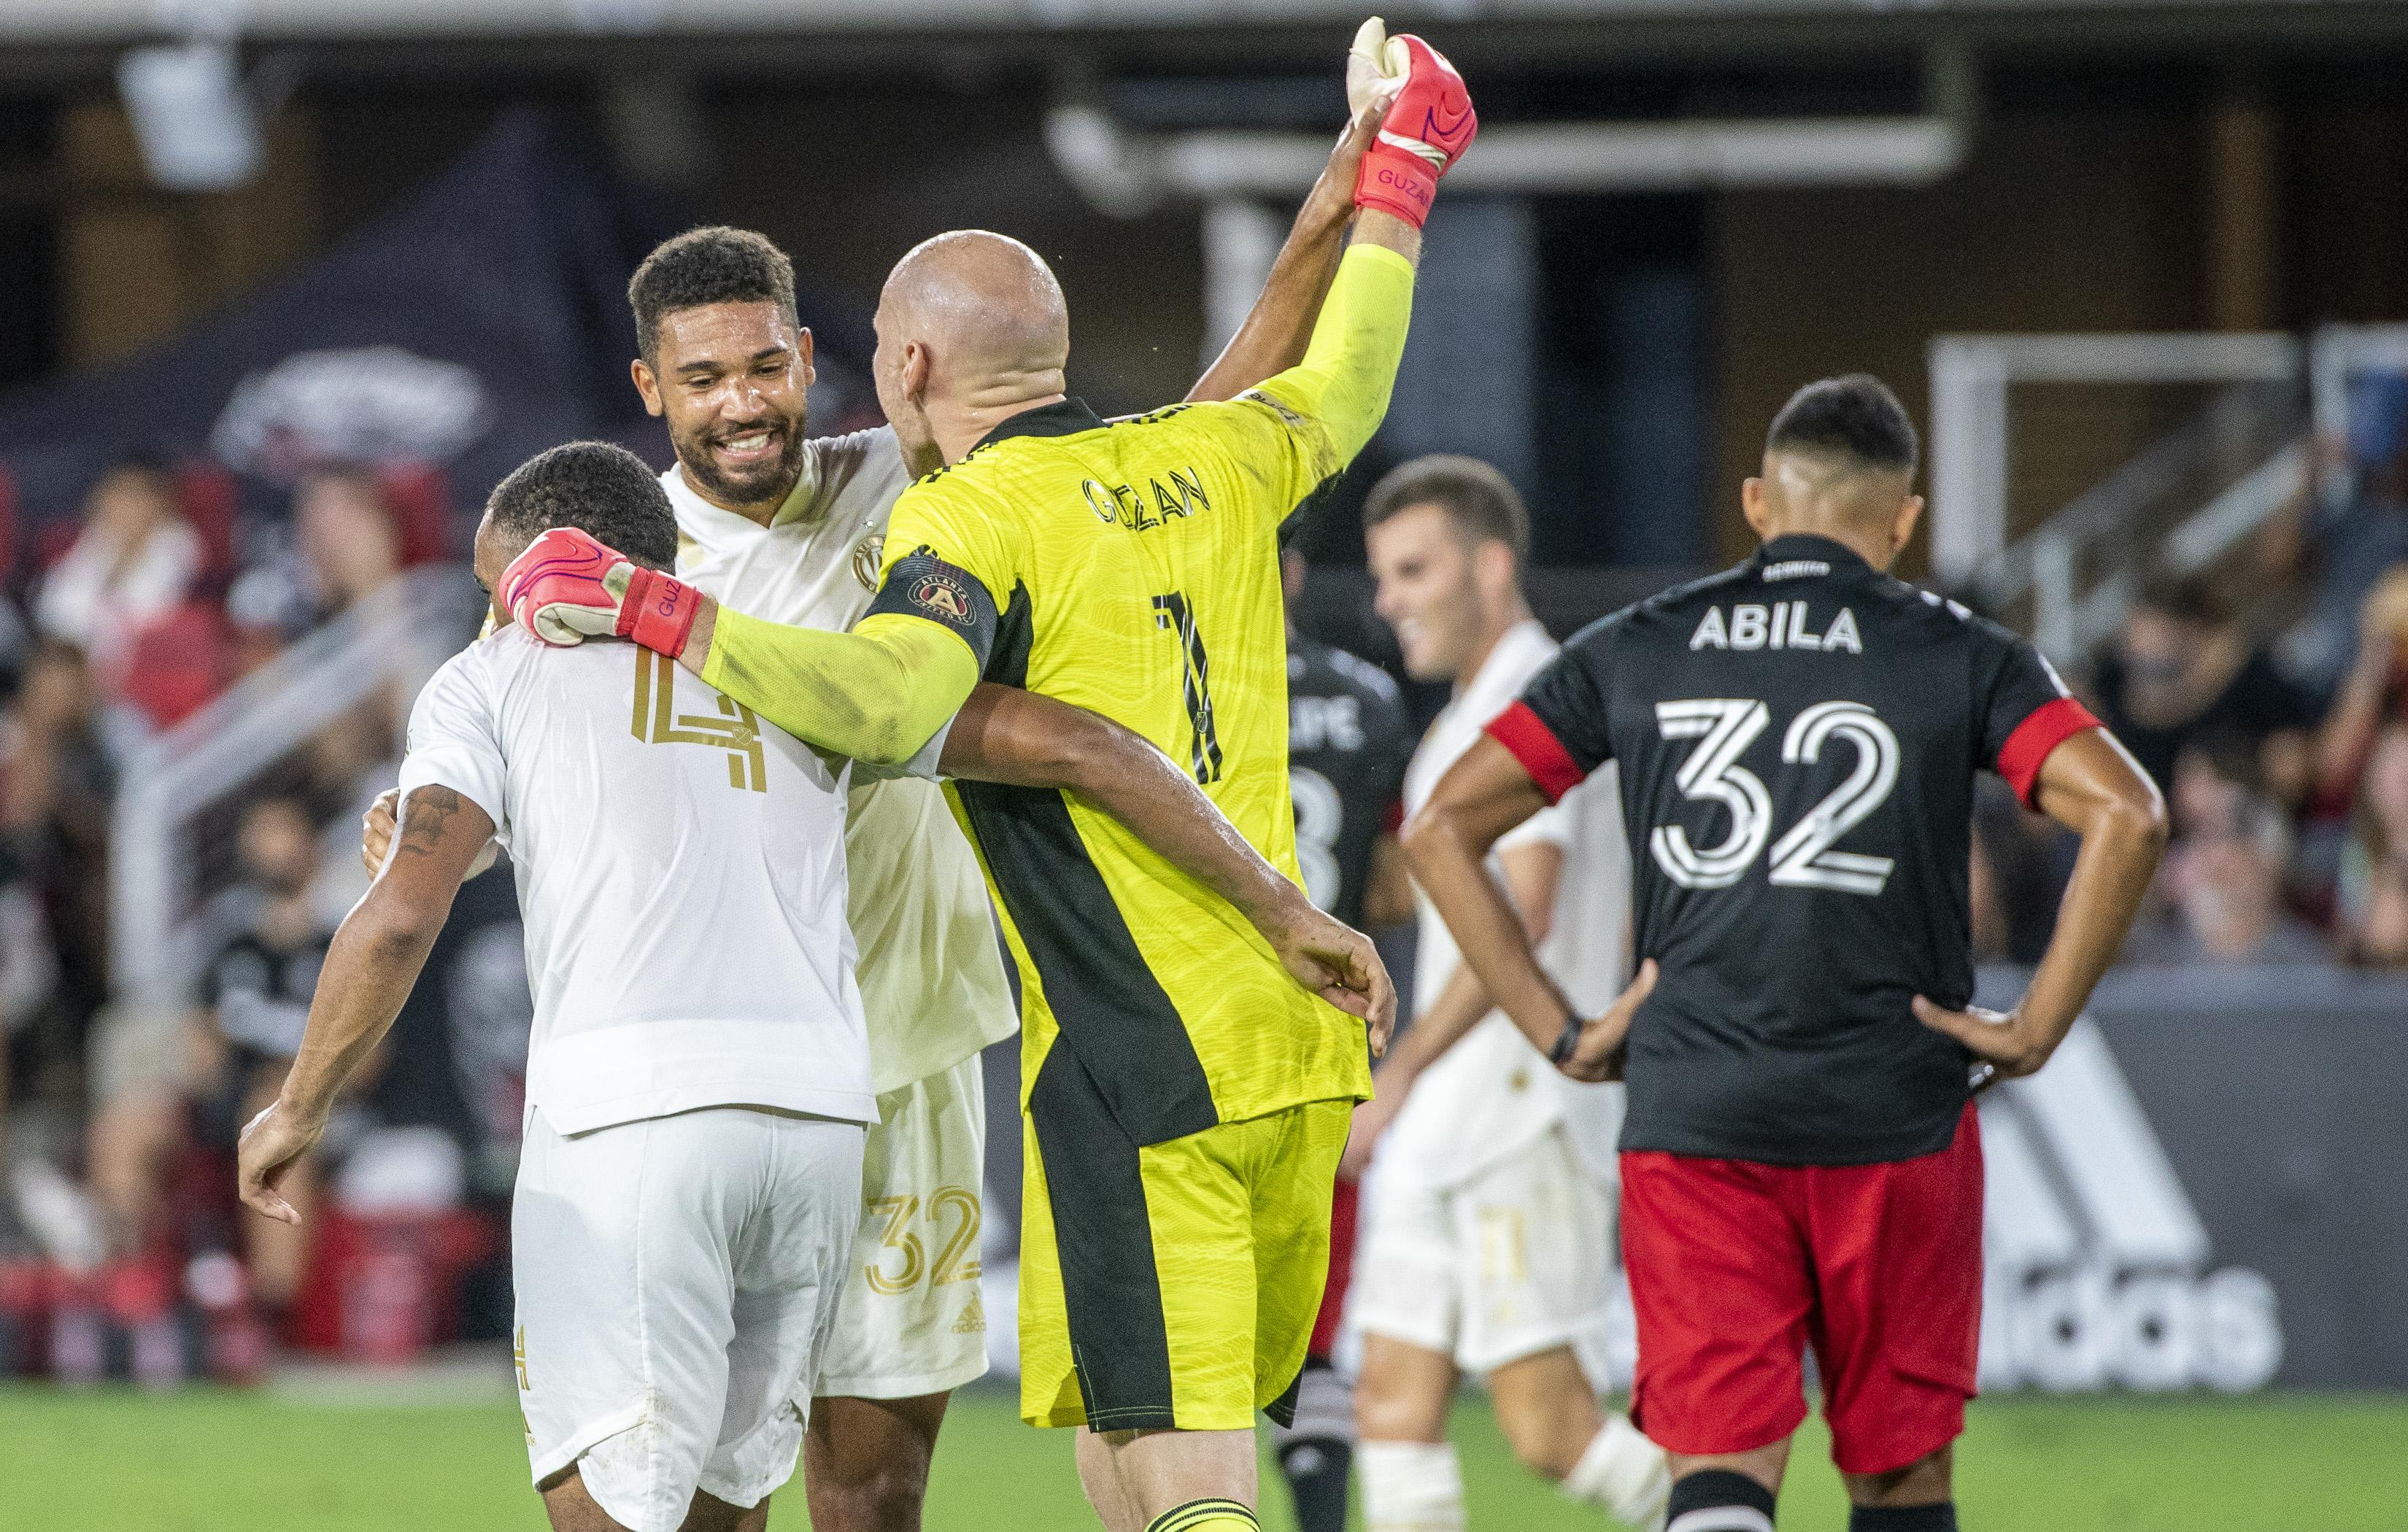 SOCCER: AUG 21 MLS - Atlanta United FC at DC United